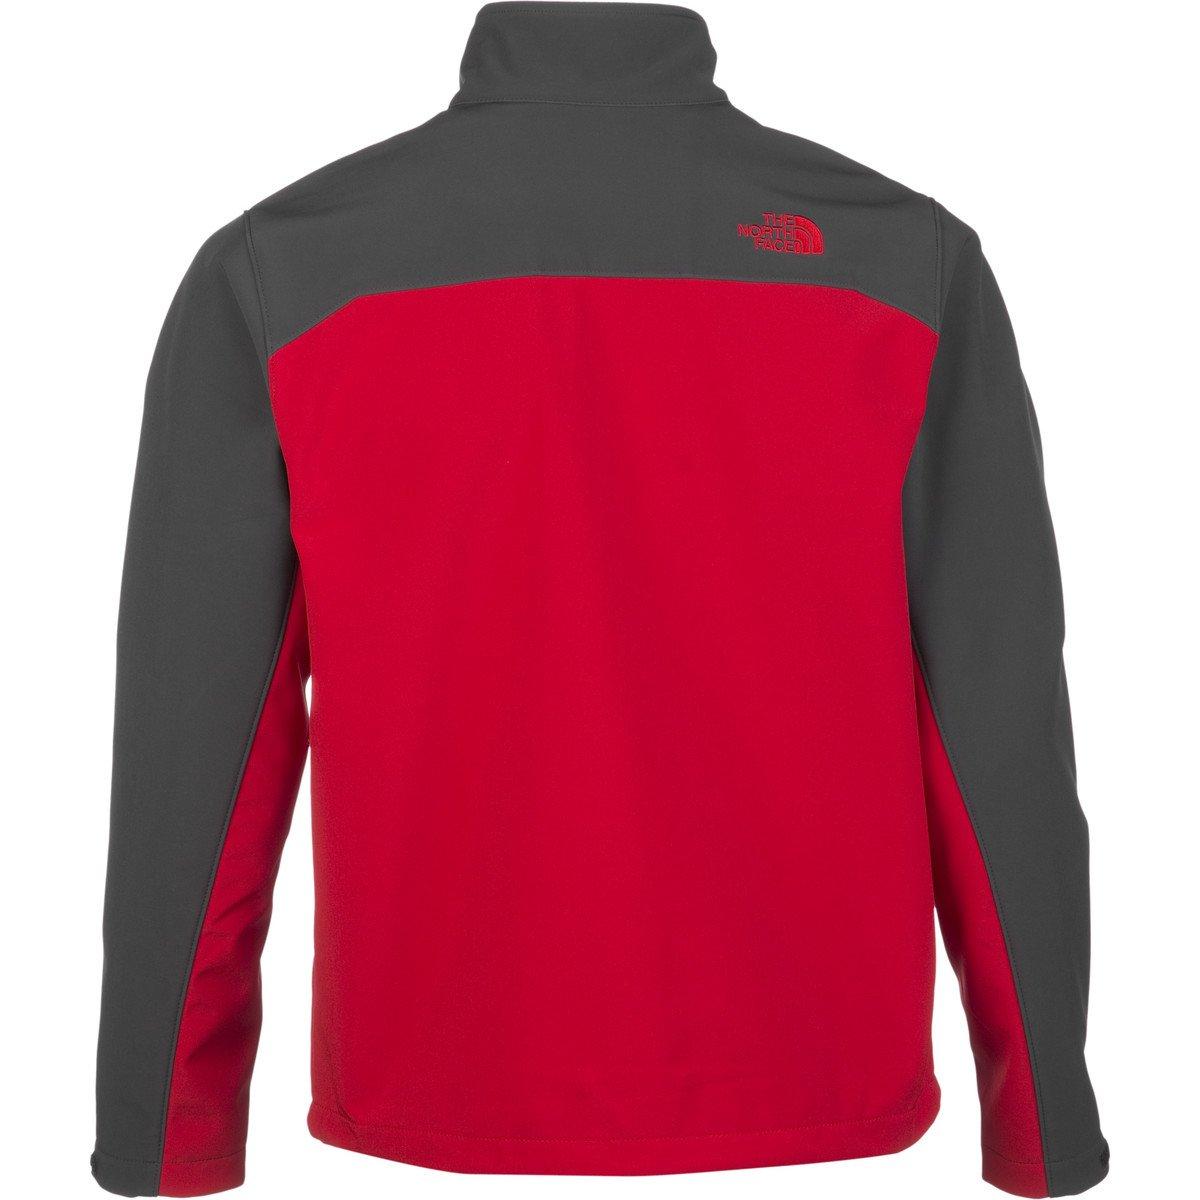 6693fdaffe6 Amazon.com  The North Face Apex Bionic Soft Shell Jacket - Men s  Clothing